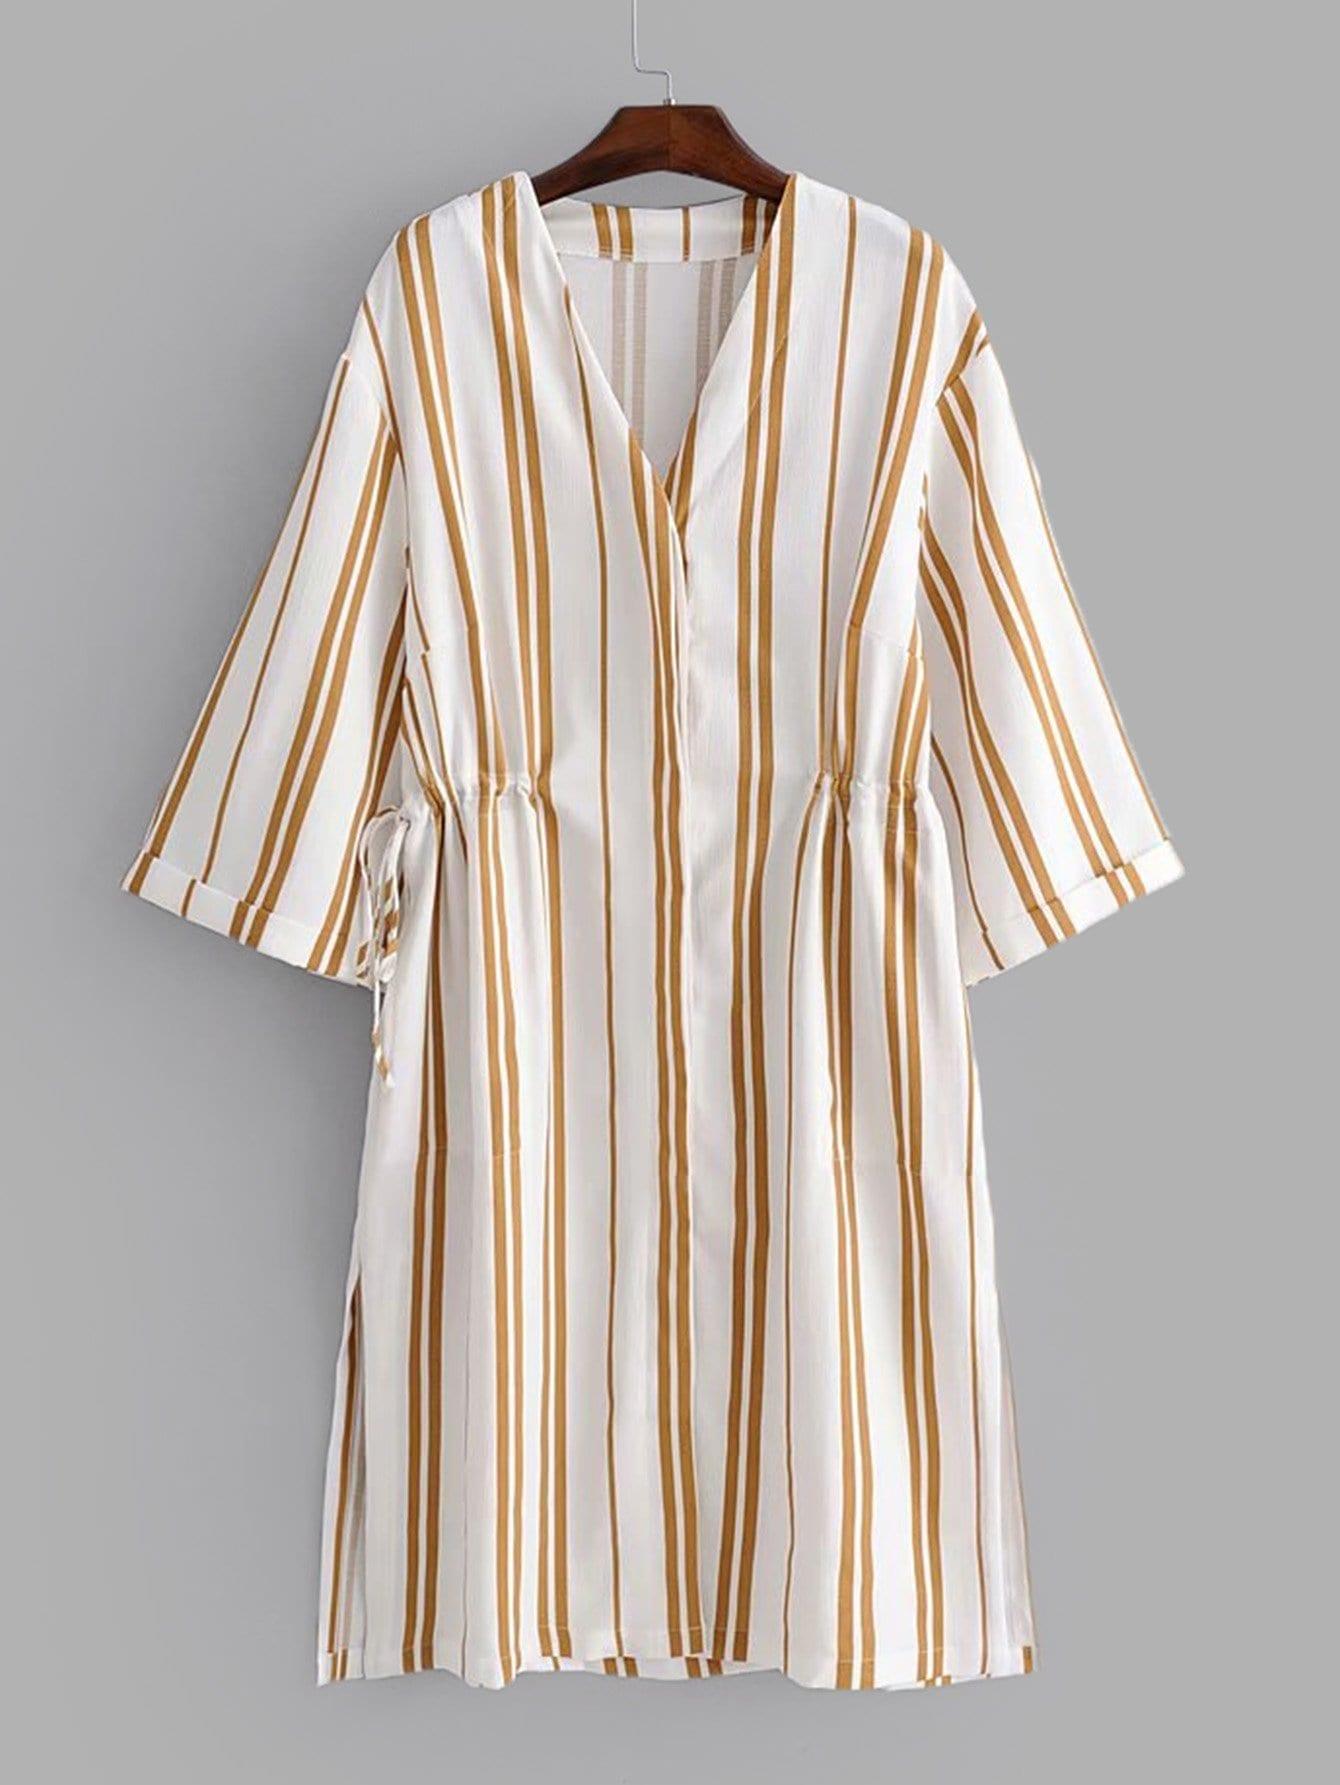 все цены на Vertical-Striped Slit Side Drawstring Dress онлайн